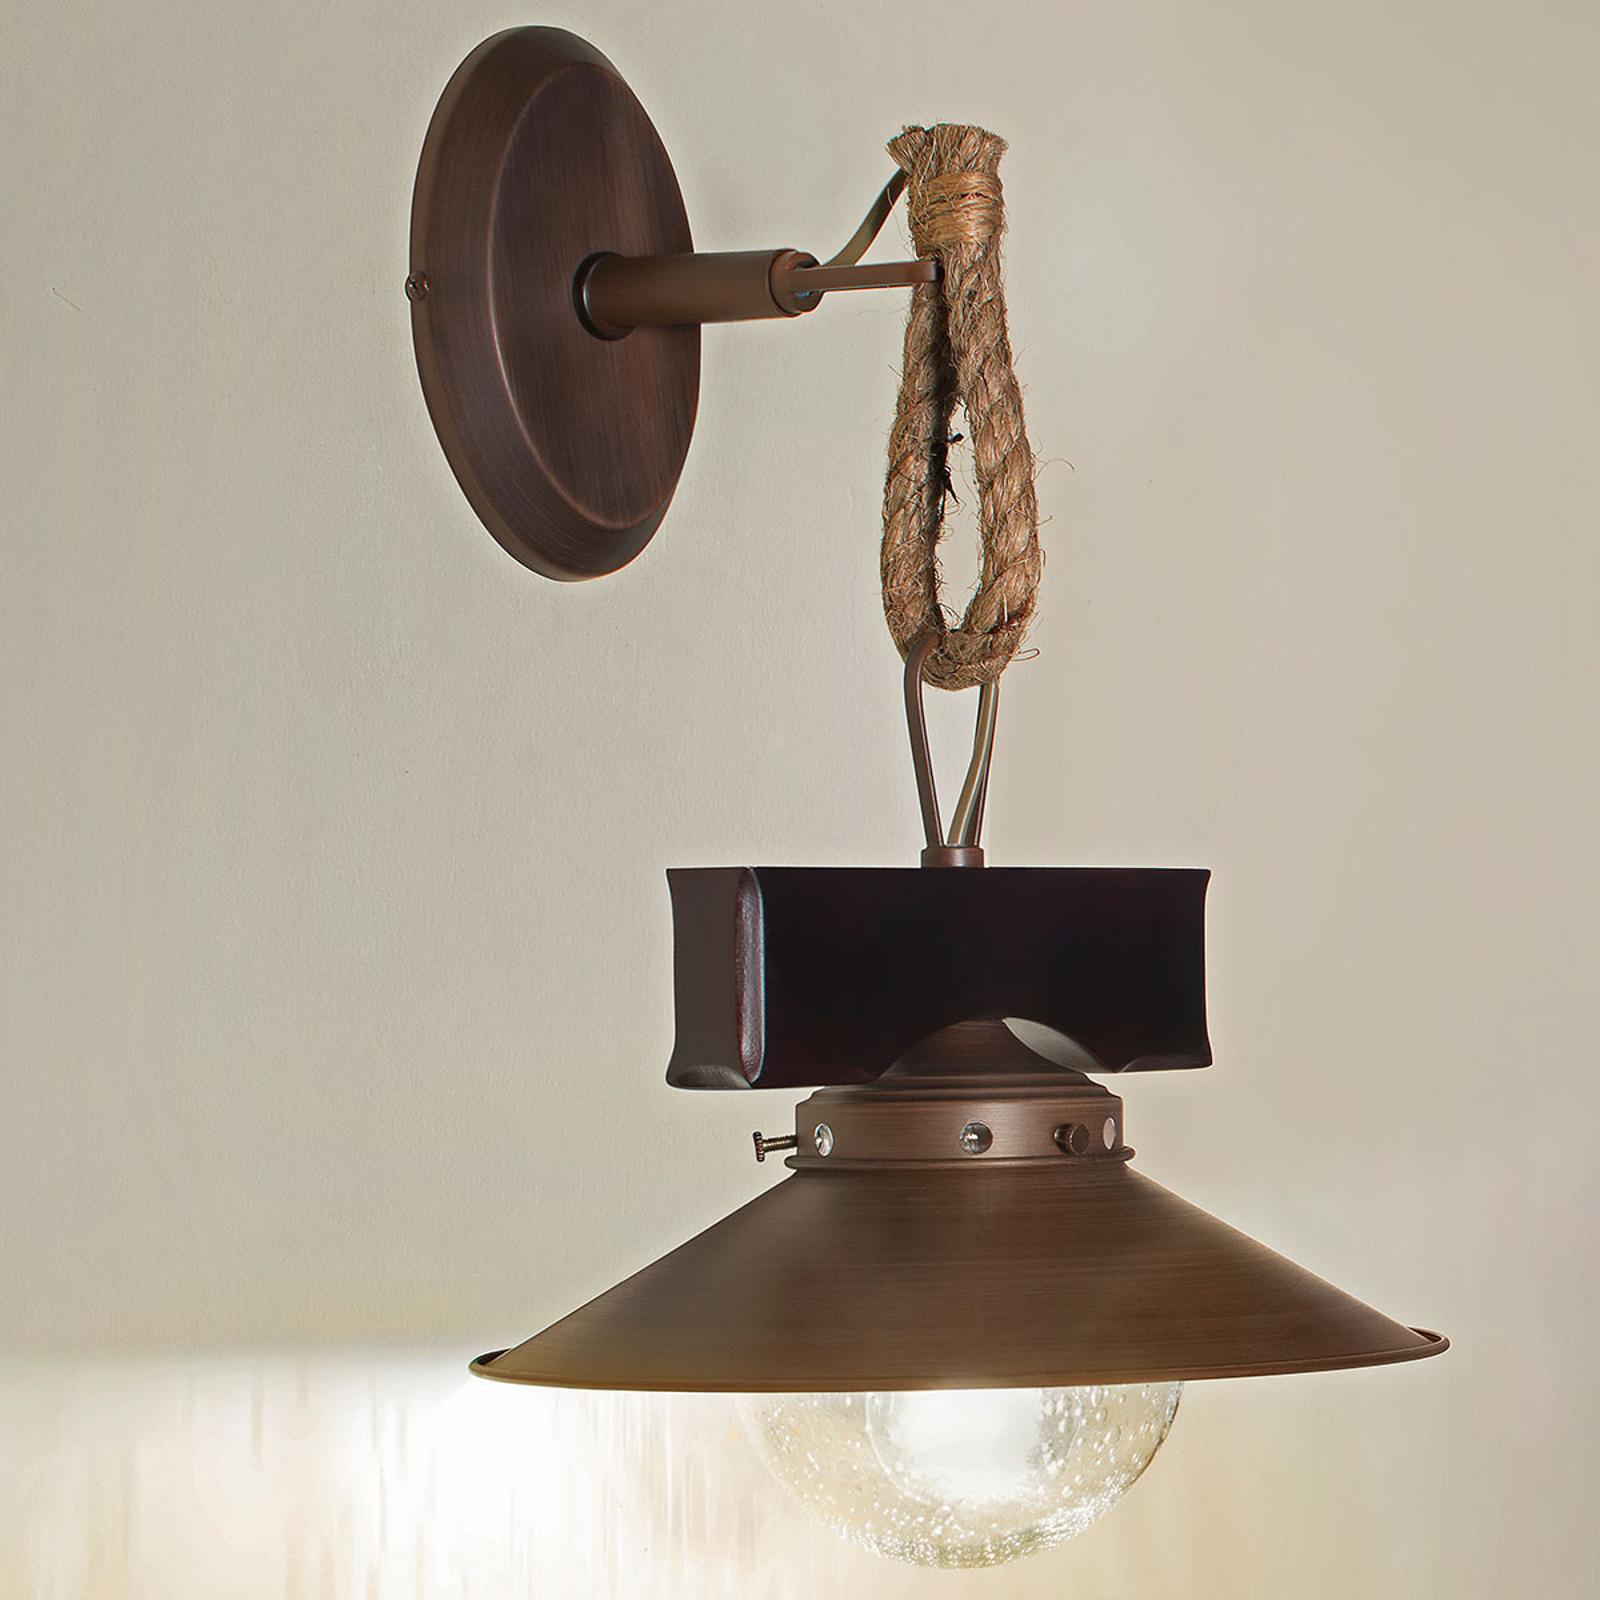 Rustieke wandlamp Nudos in materiaalmix